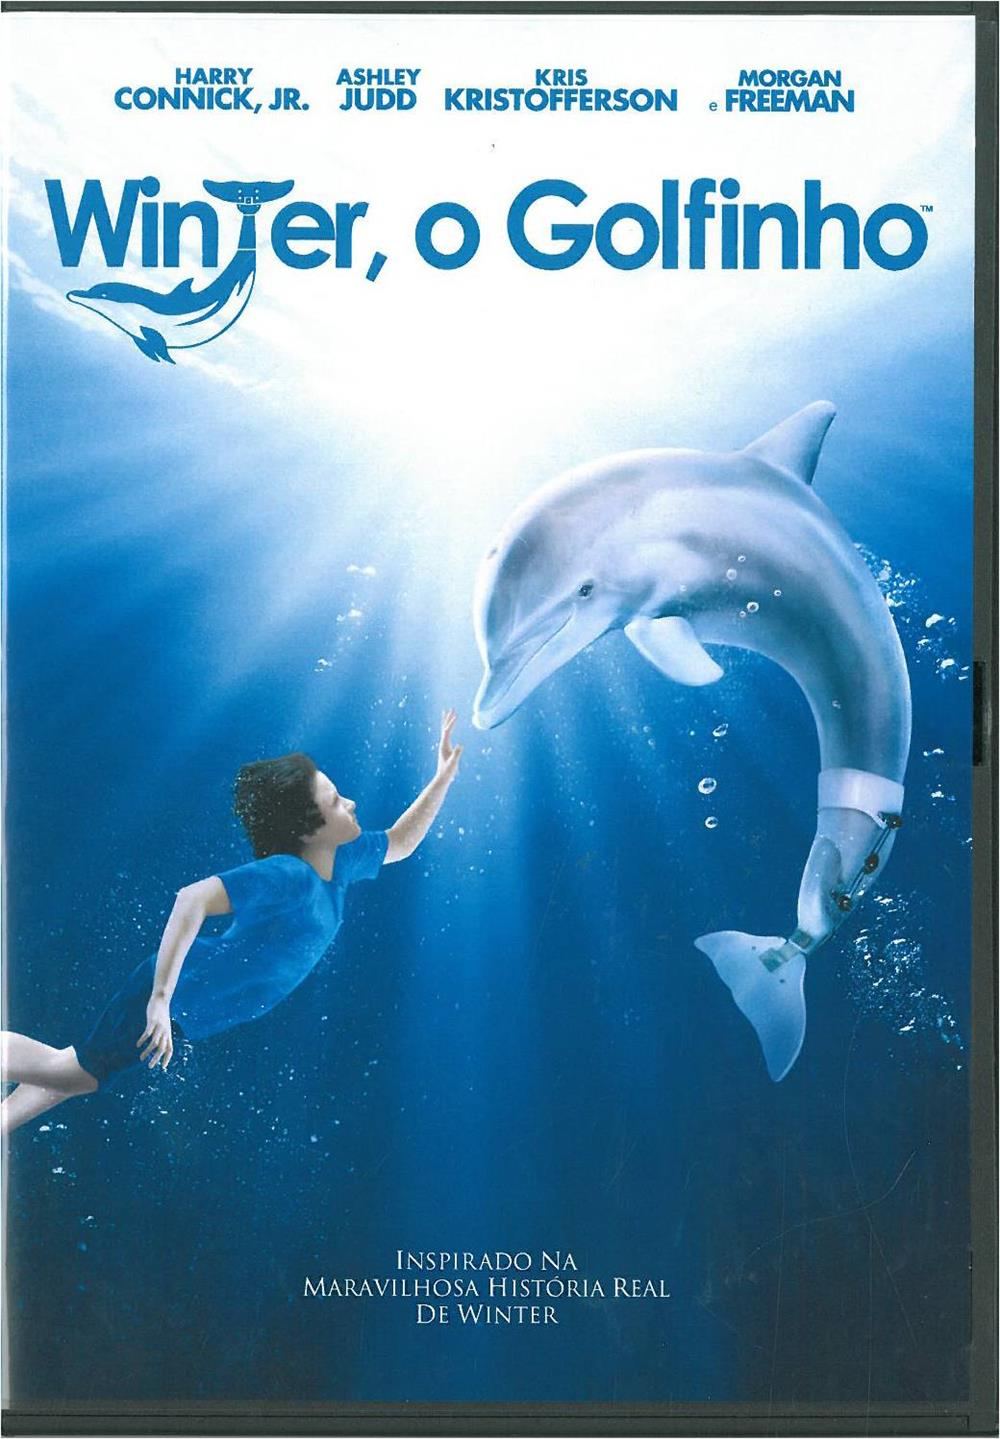 Winter, o golfinho_DVD.jpg